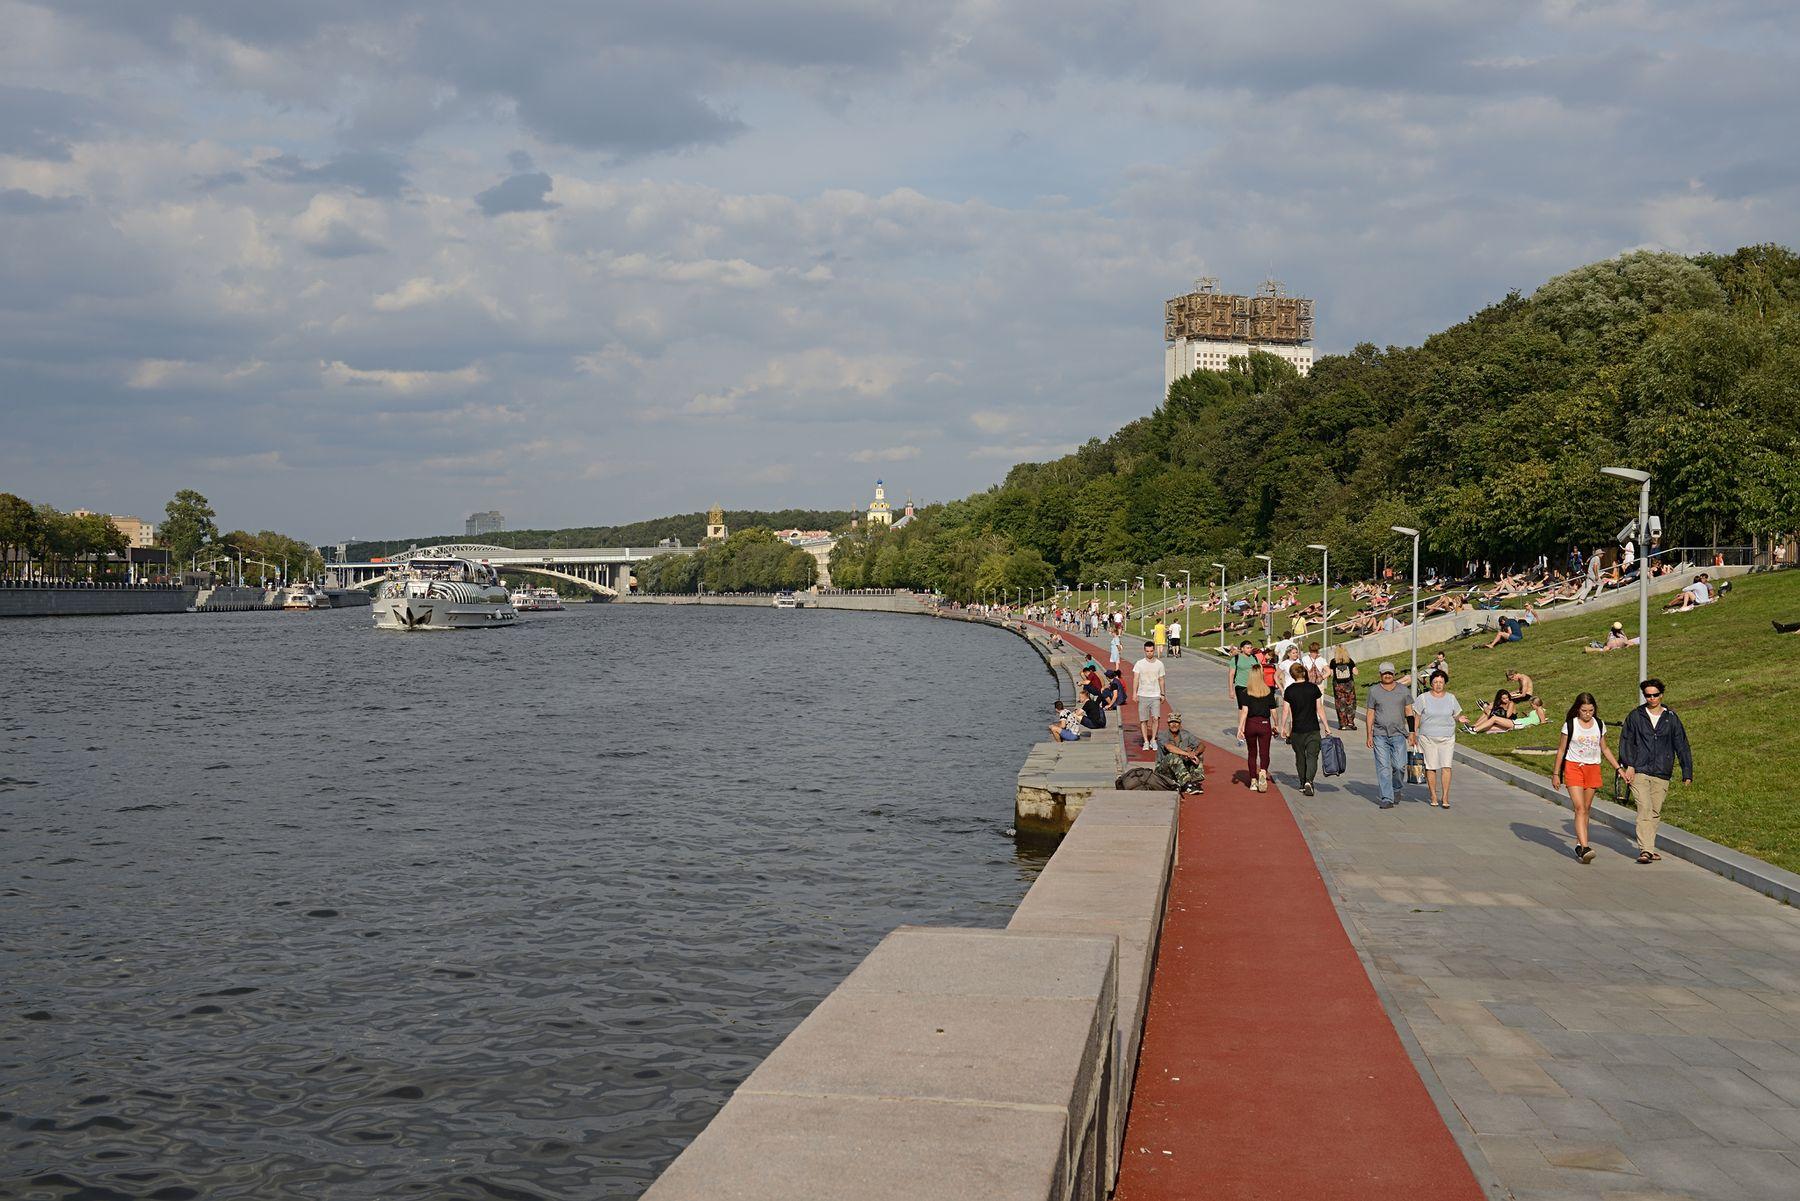 Андреевская набережная Россия Москва Андреевская енабередная Москва-река лето